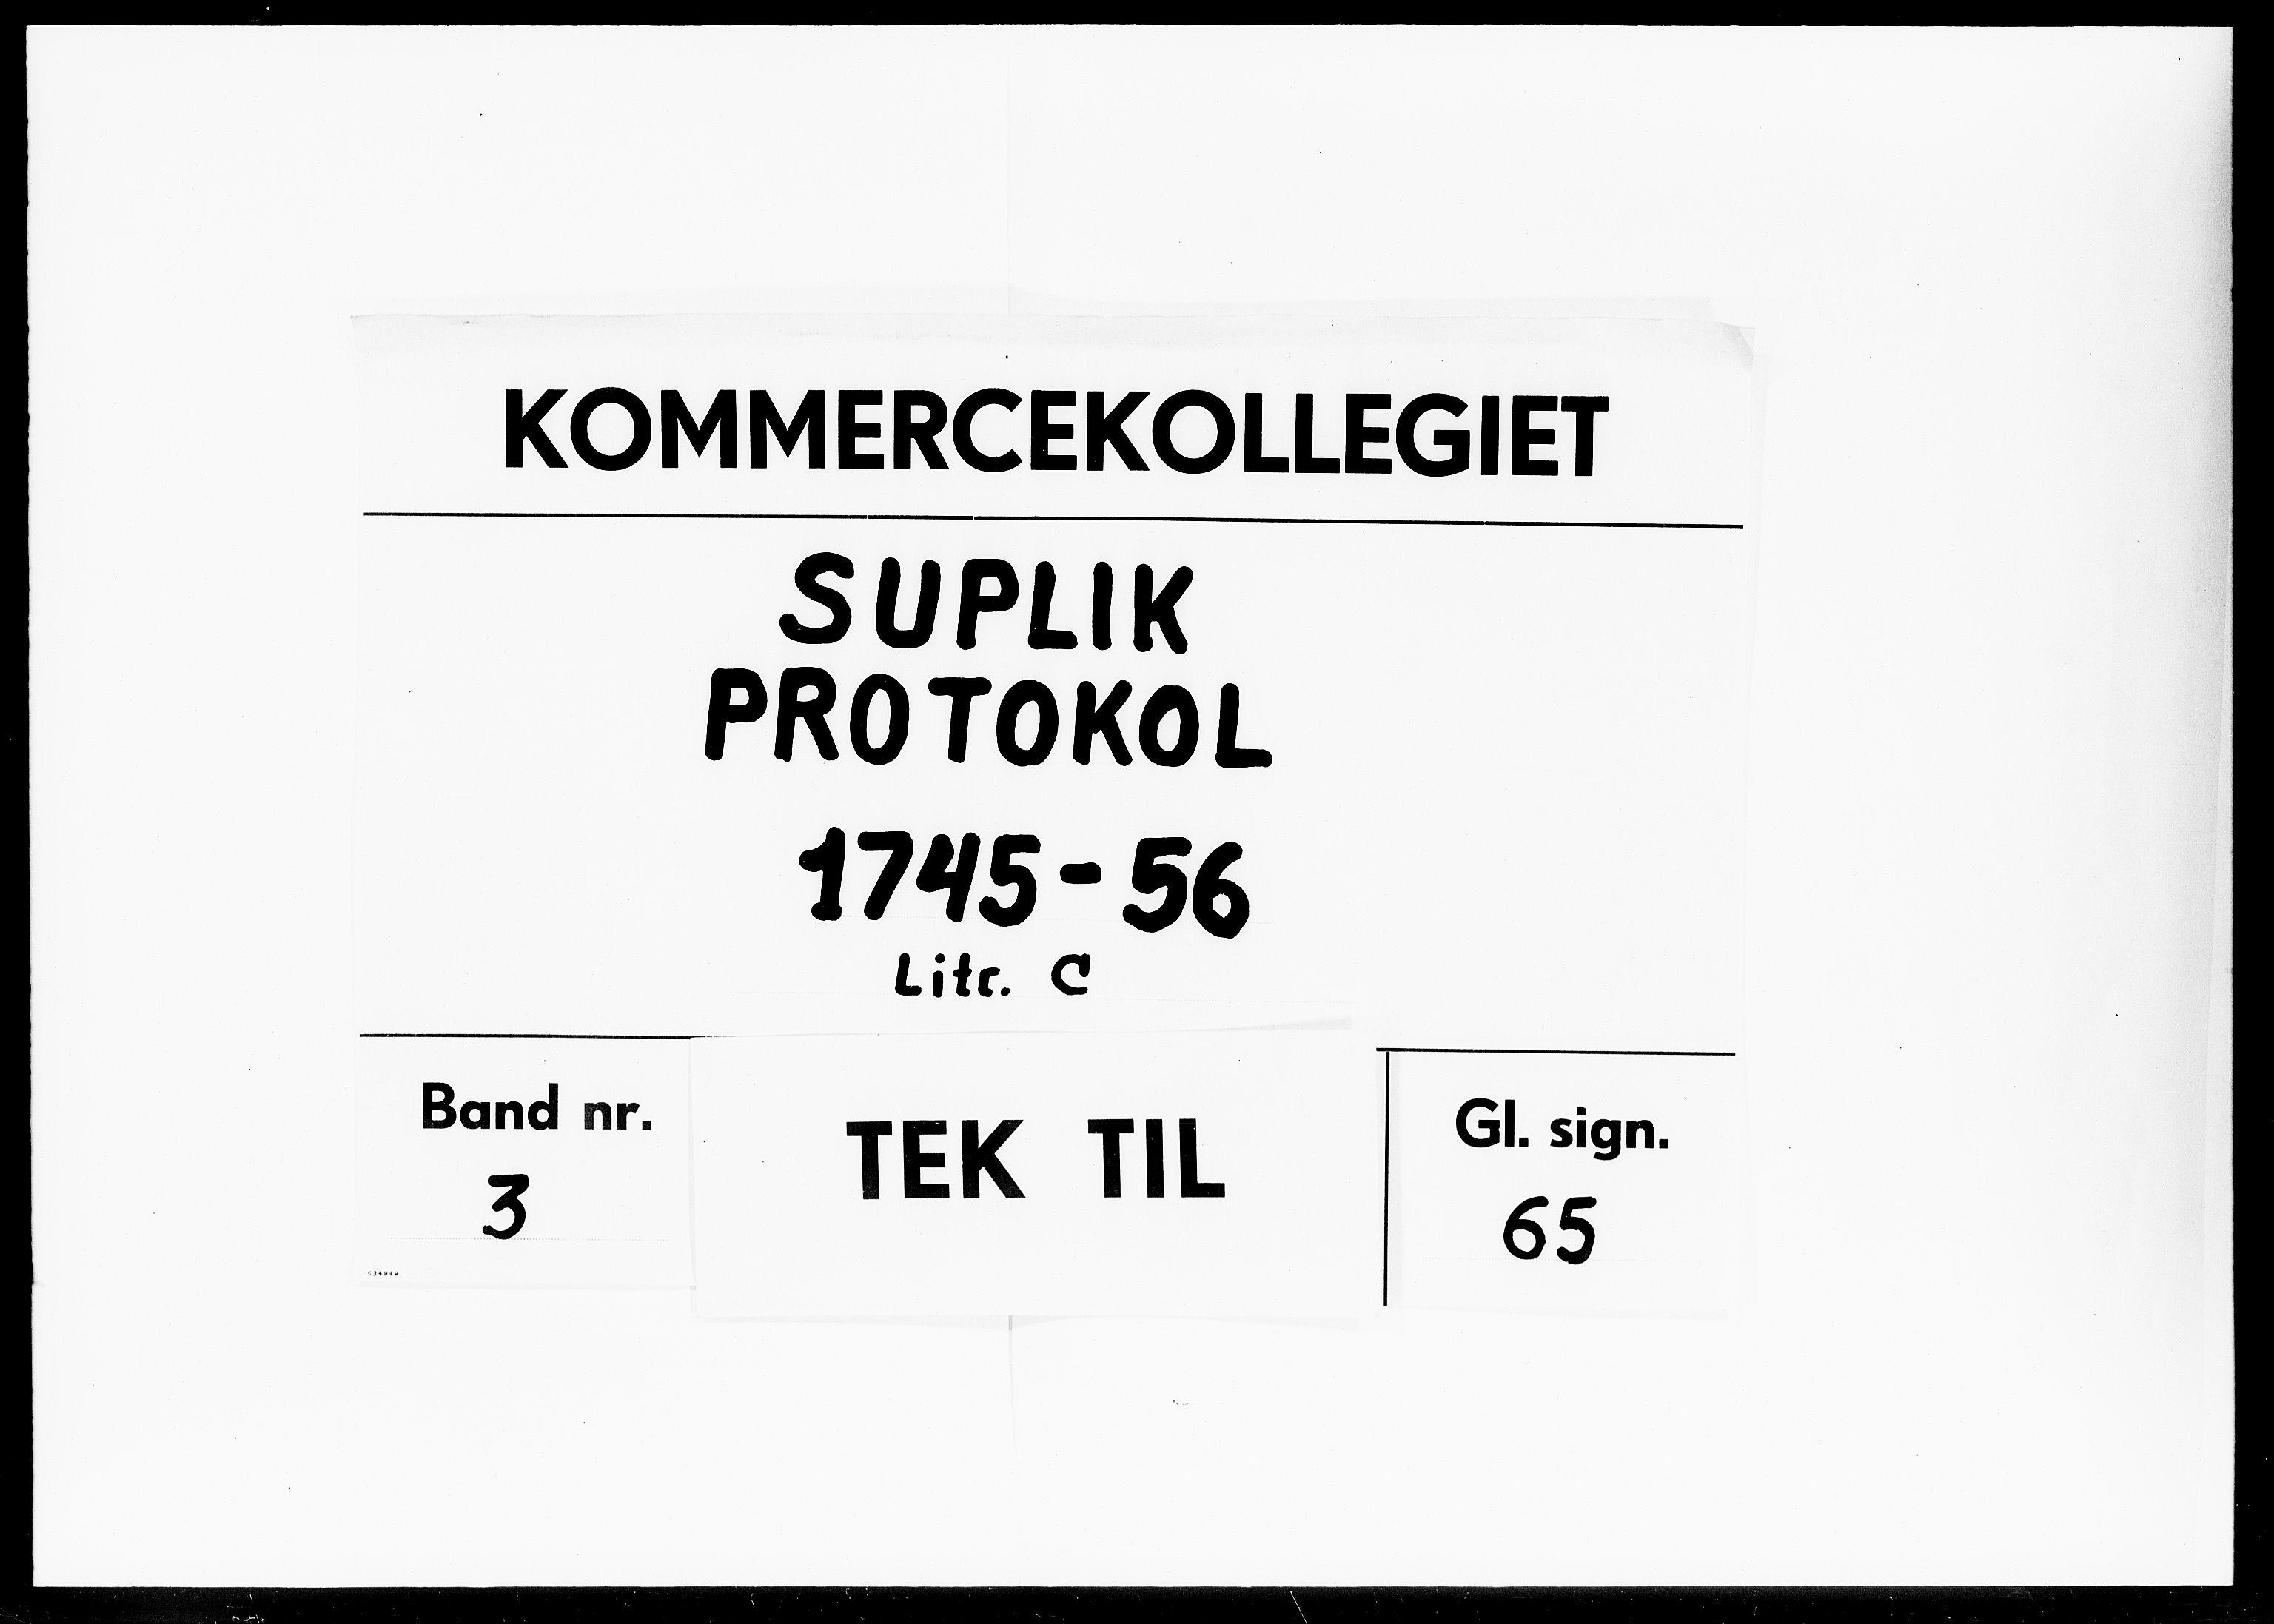 DRA, Kommercekollegiet, Dansk-Norske Sekretariat, -/33: Suplik Protokol C, 1745-1756